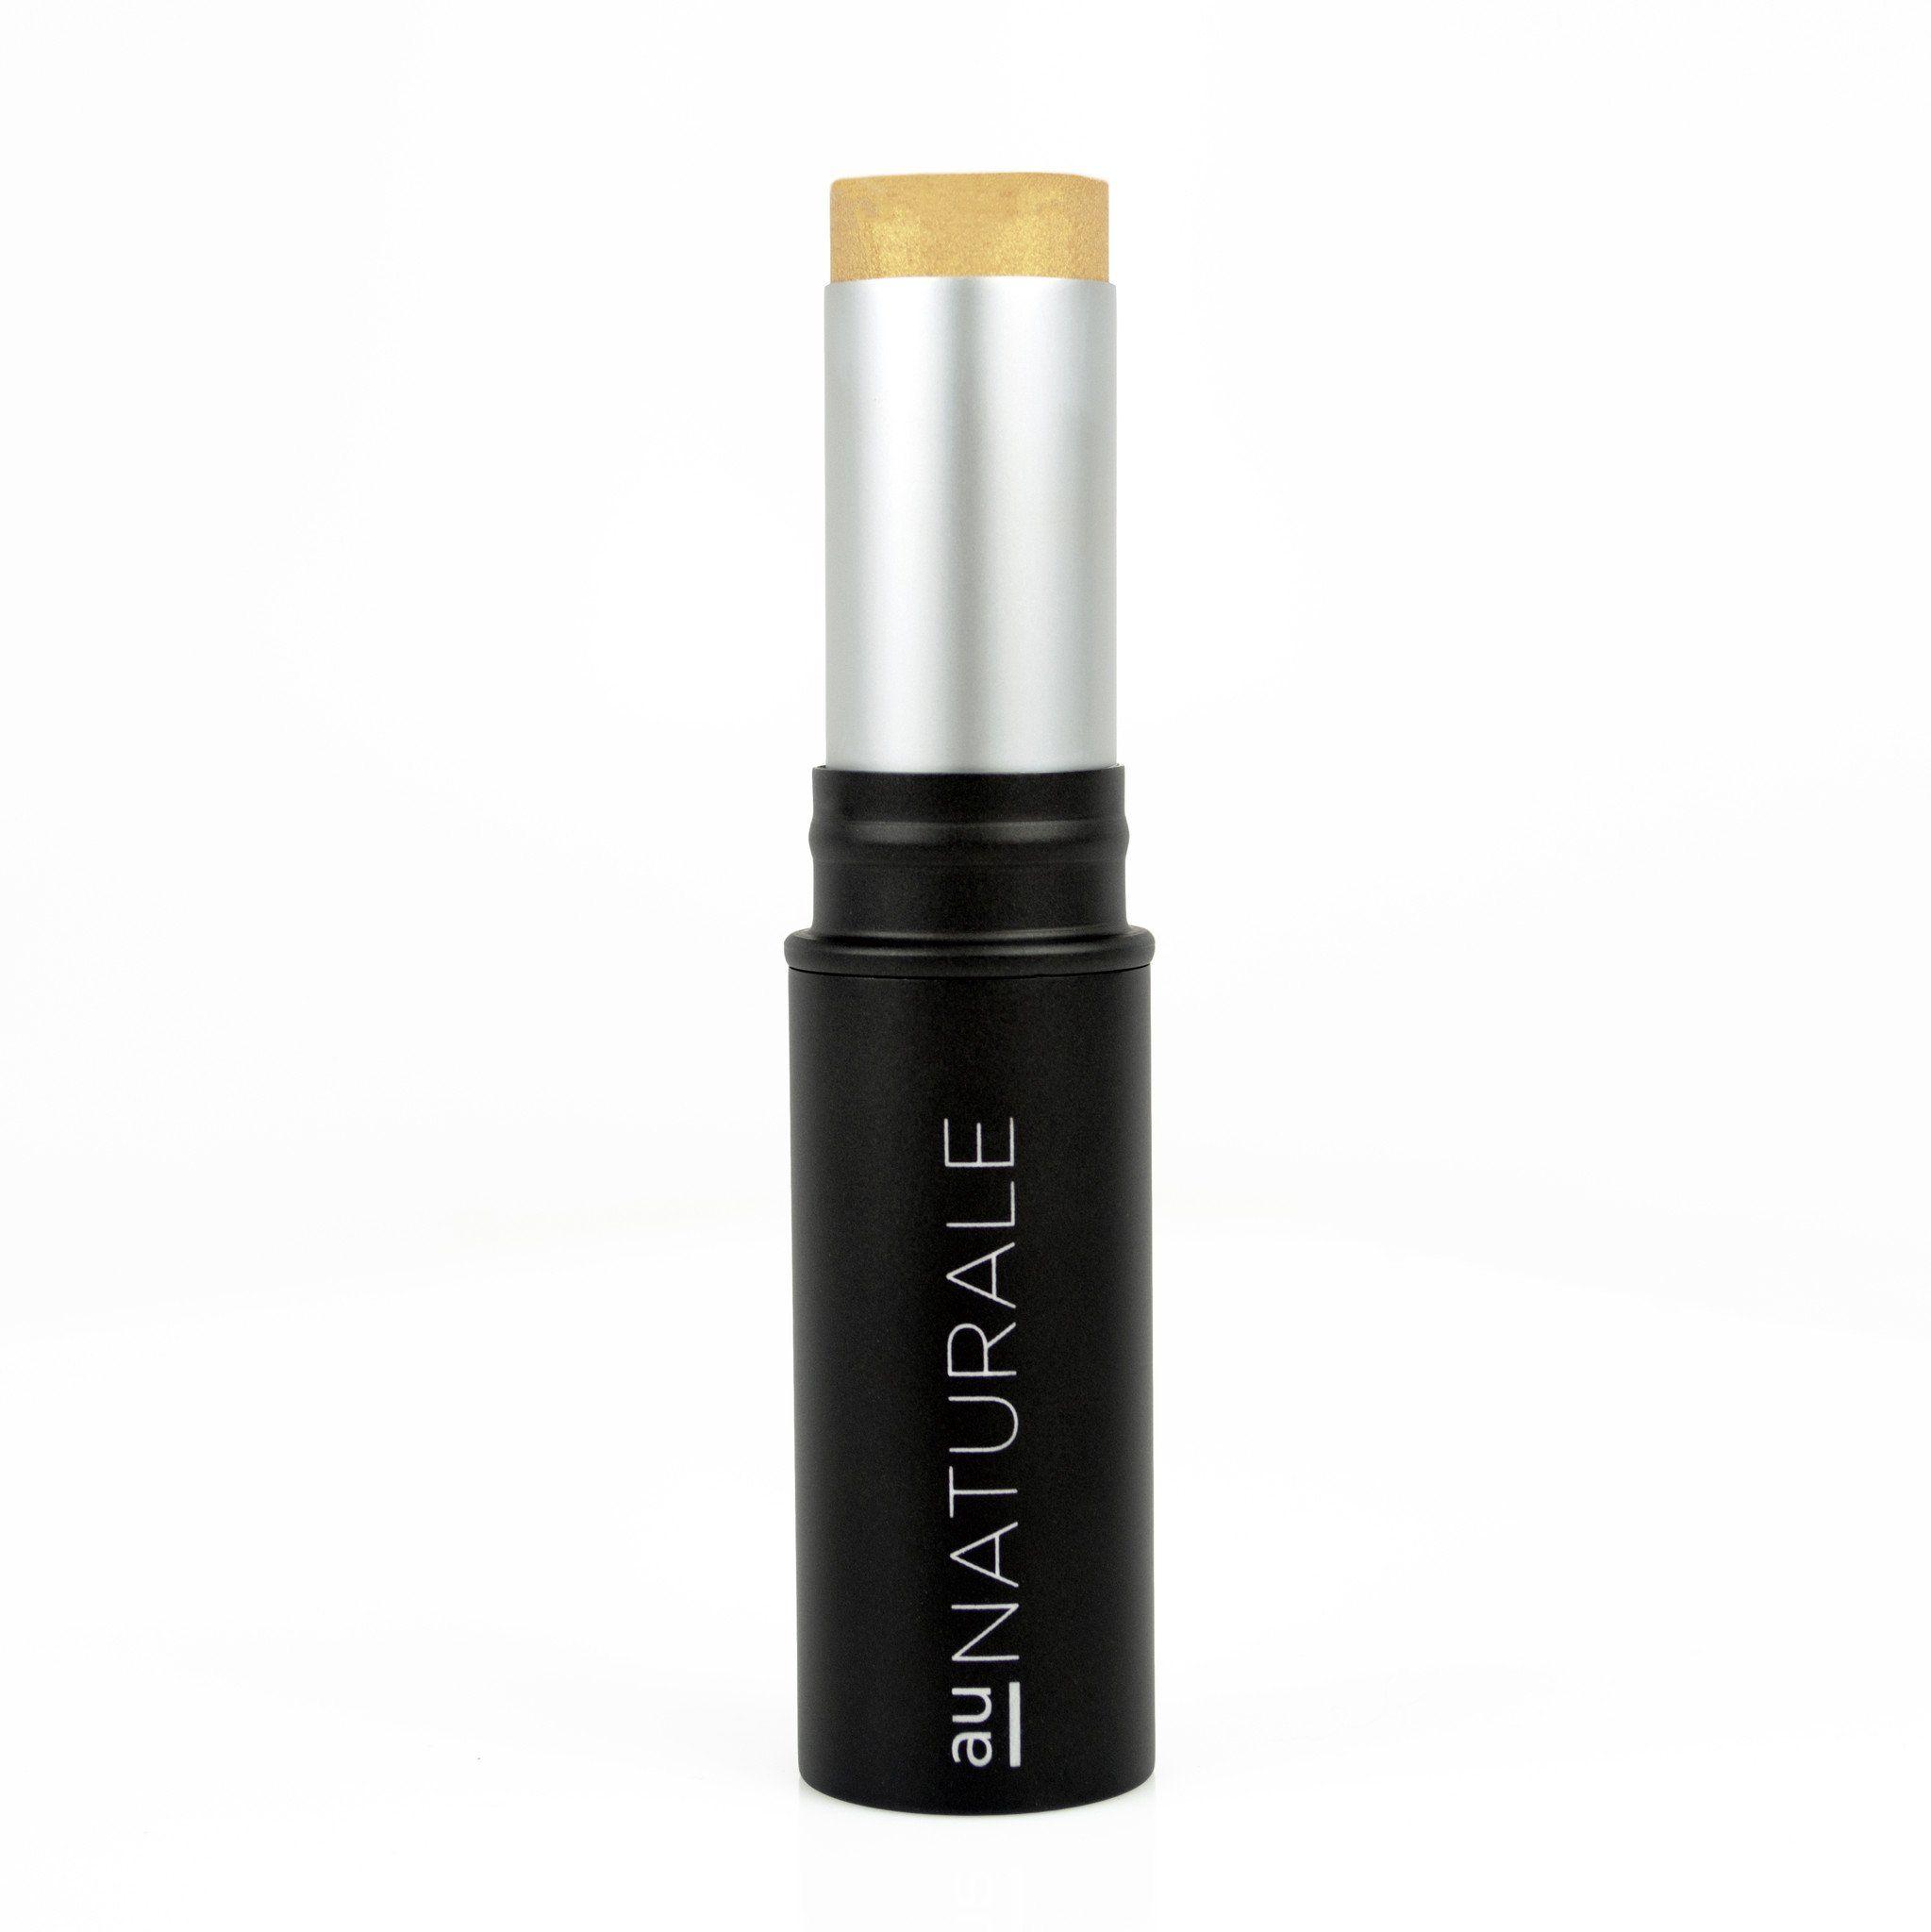 The AllGlowing Creme Highlighter Creme lipstick